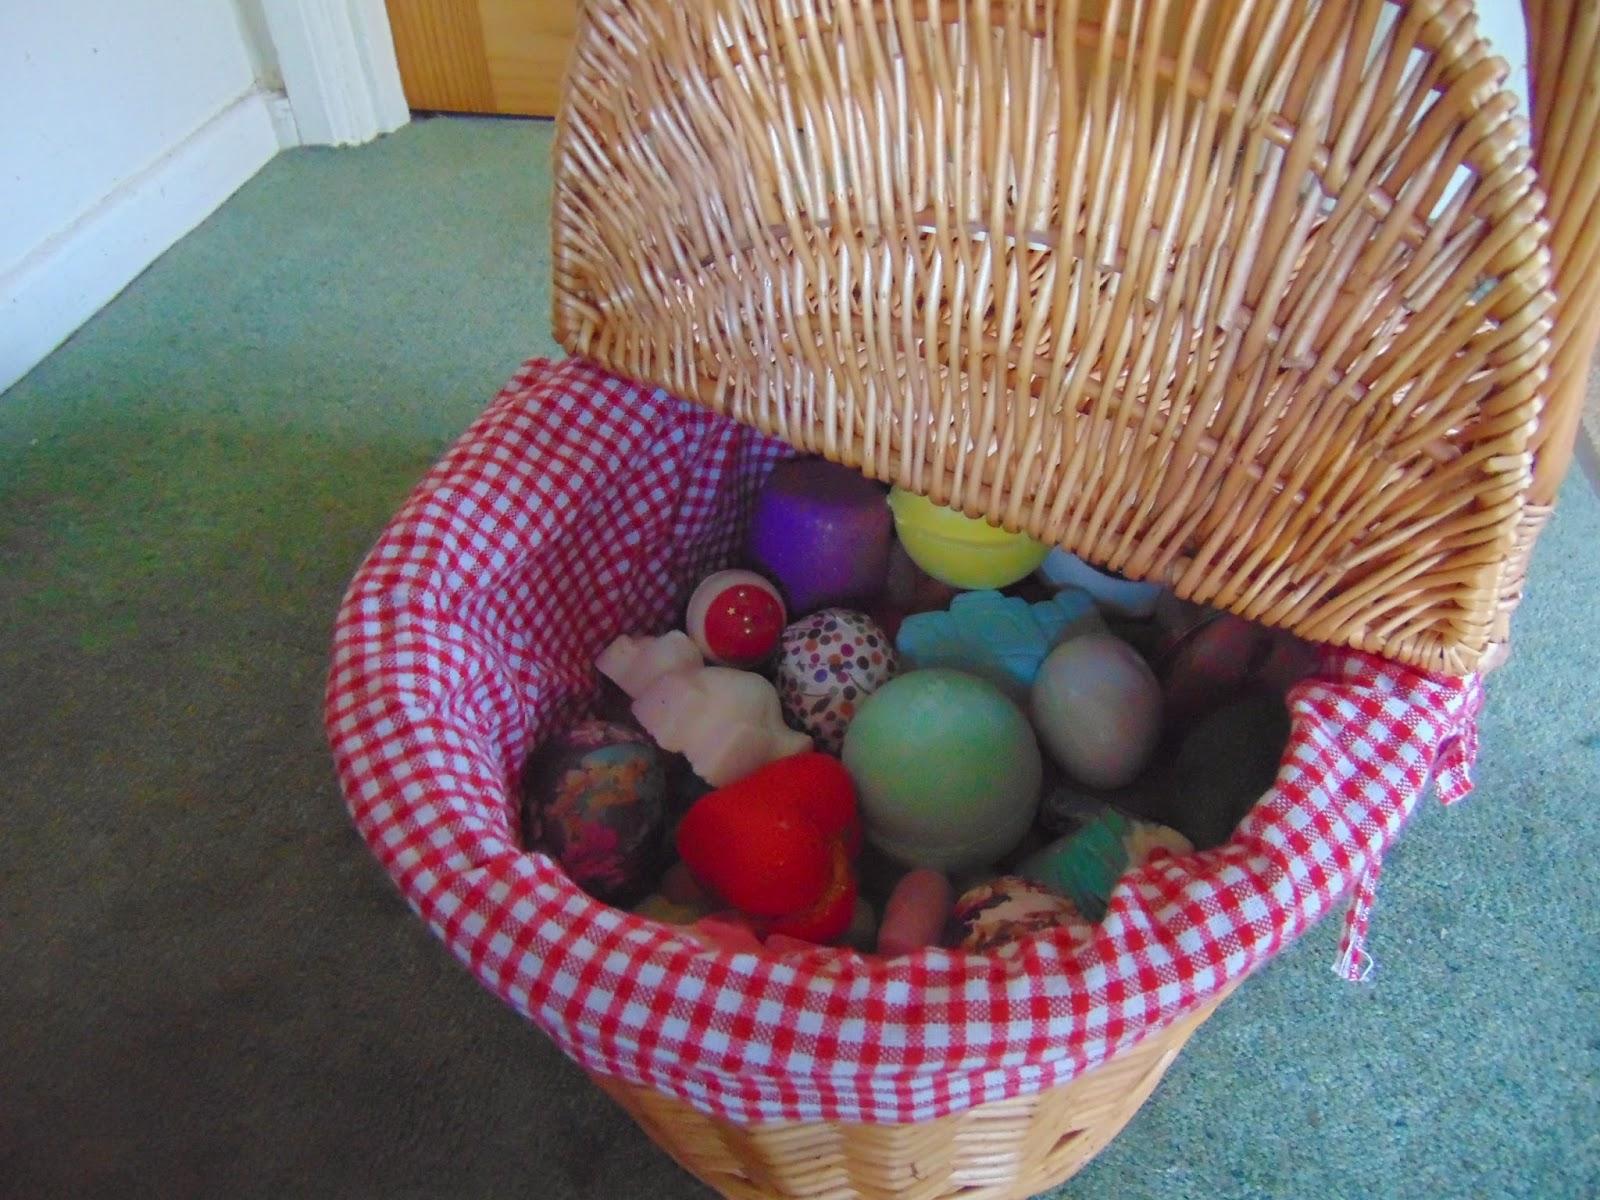 bath bomb basket lush joules bomb cosmetics